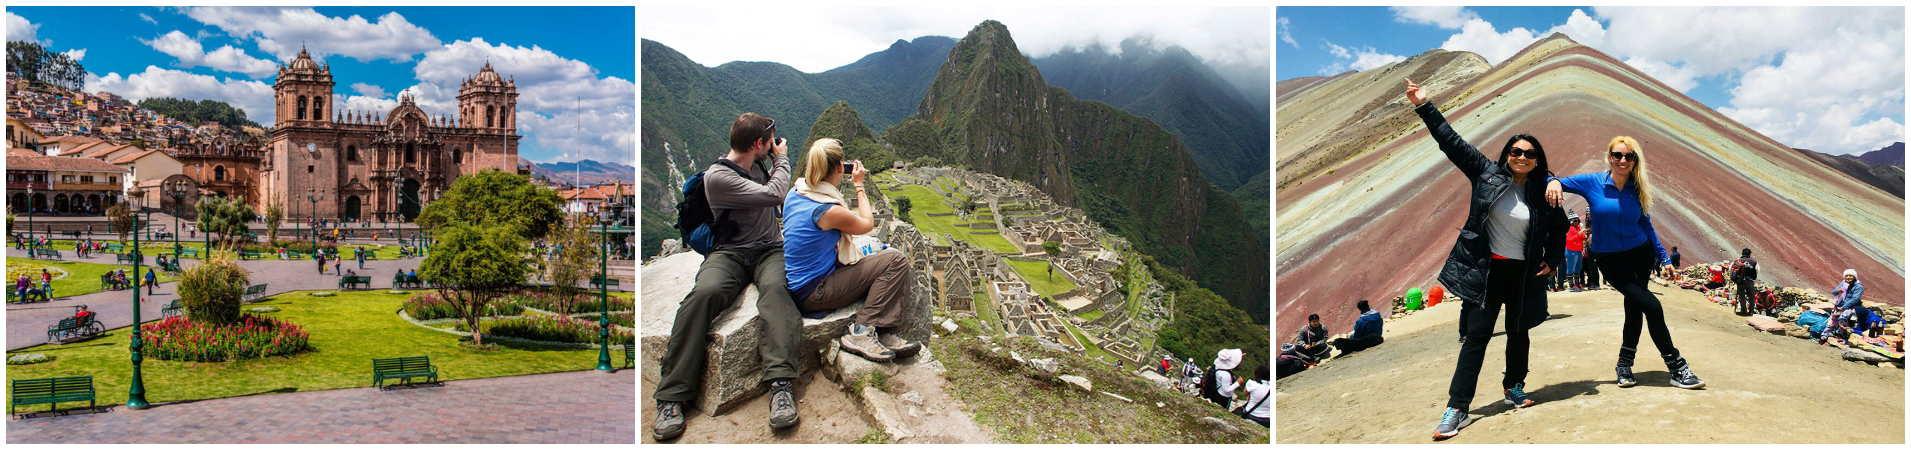 Viaje Cusco Machu Picchu Rainbow Mountain Puno